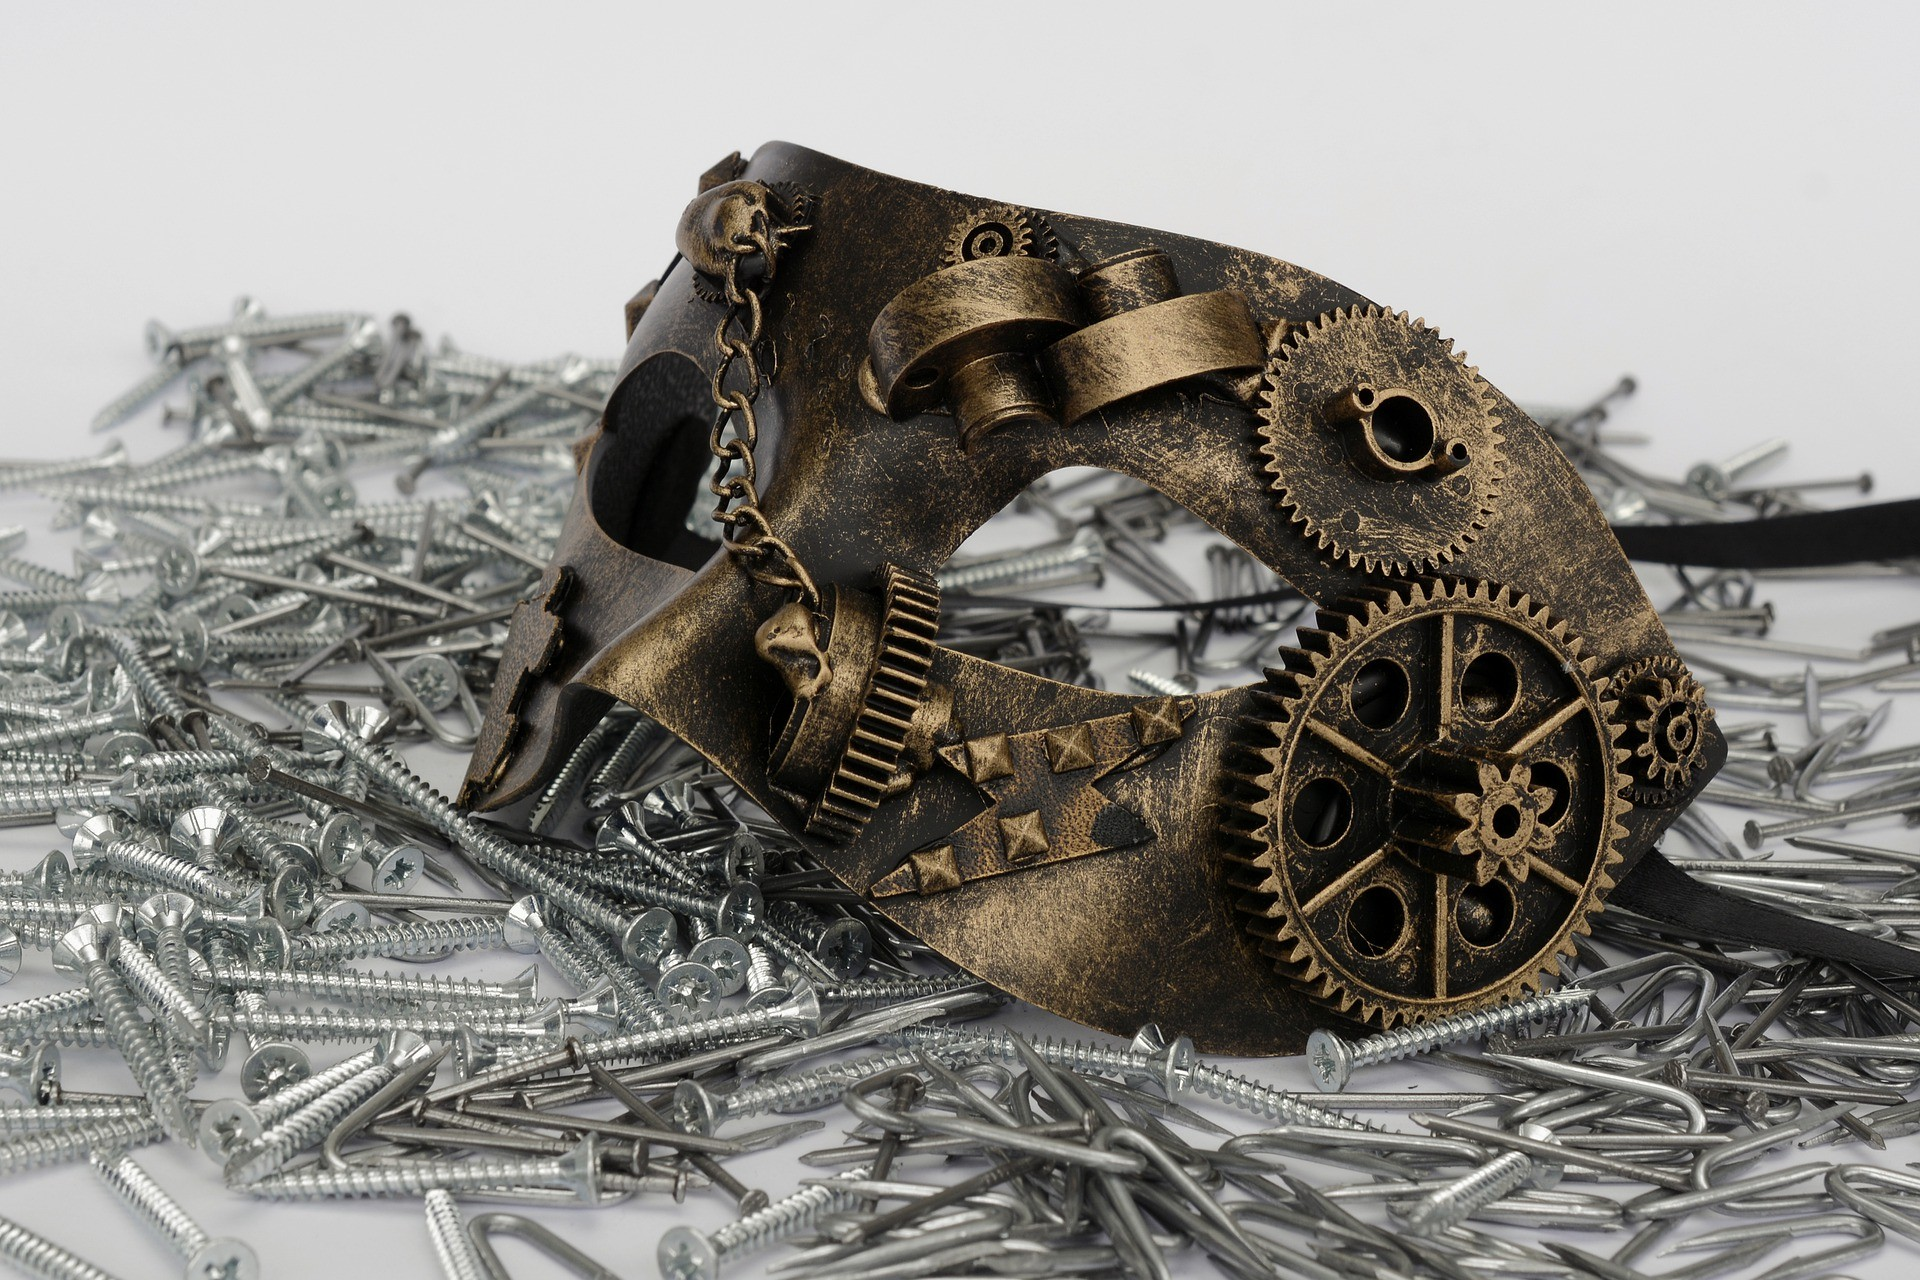 upcyklace_maska_kov_reuse_steampunk_trideni